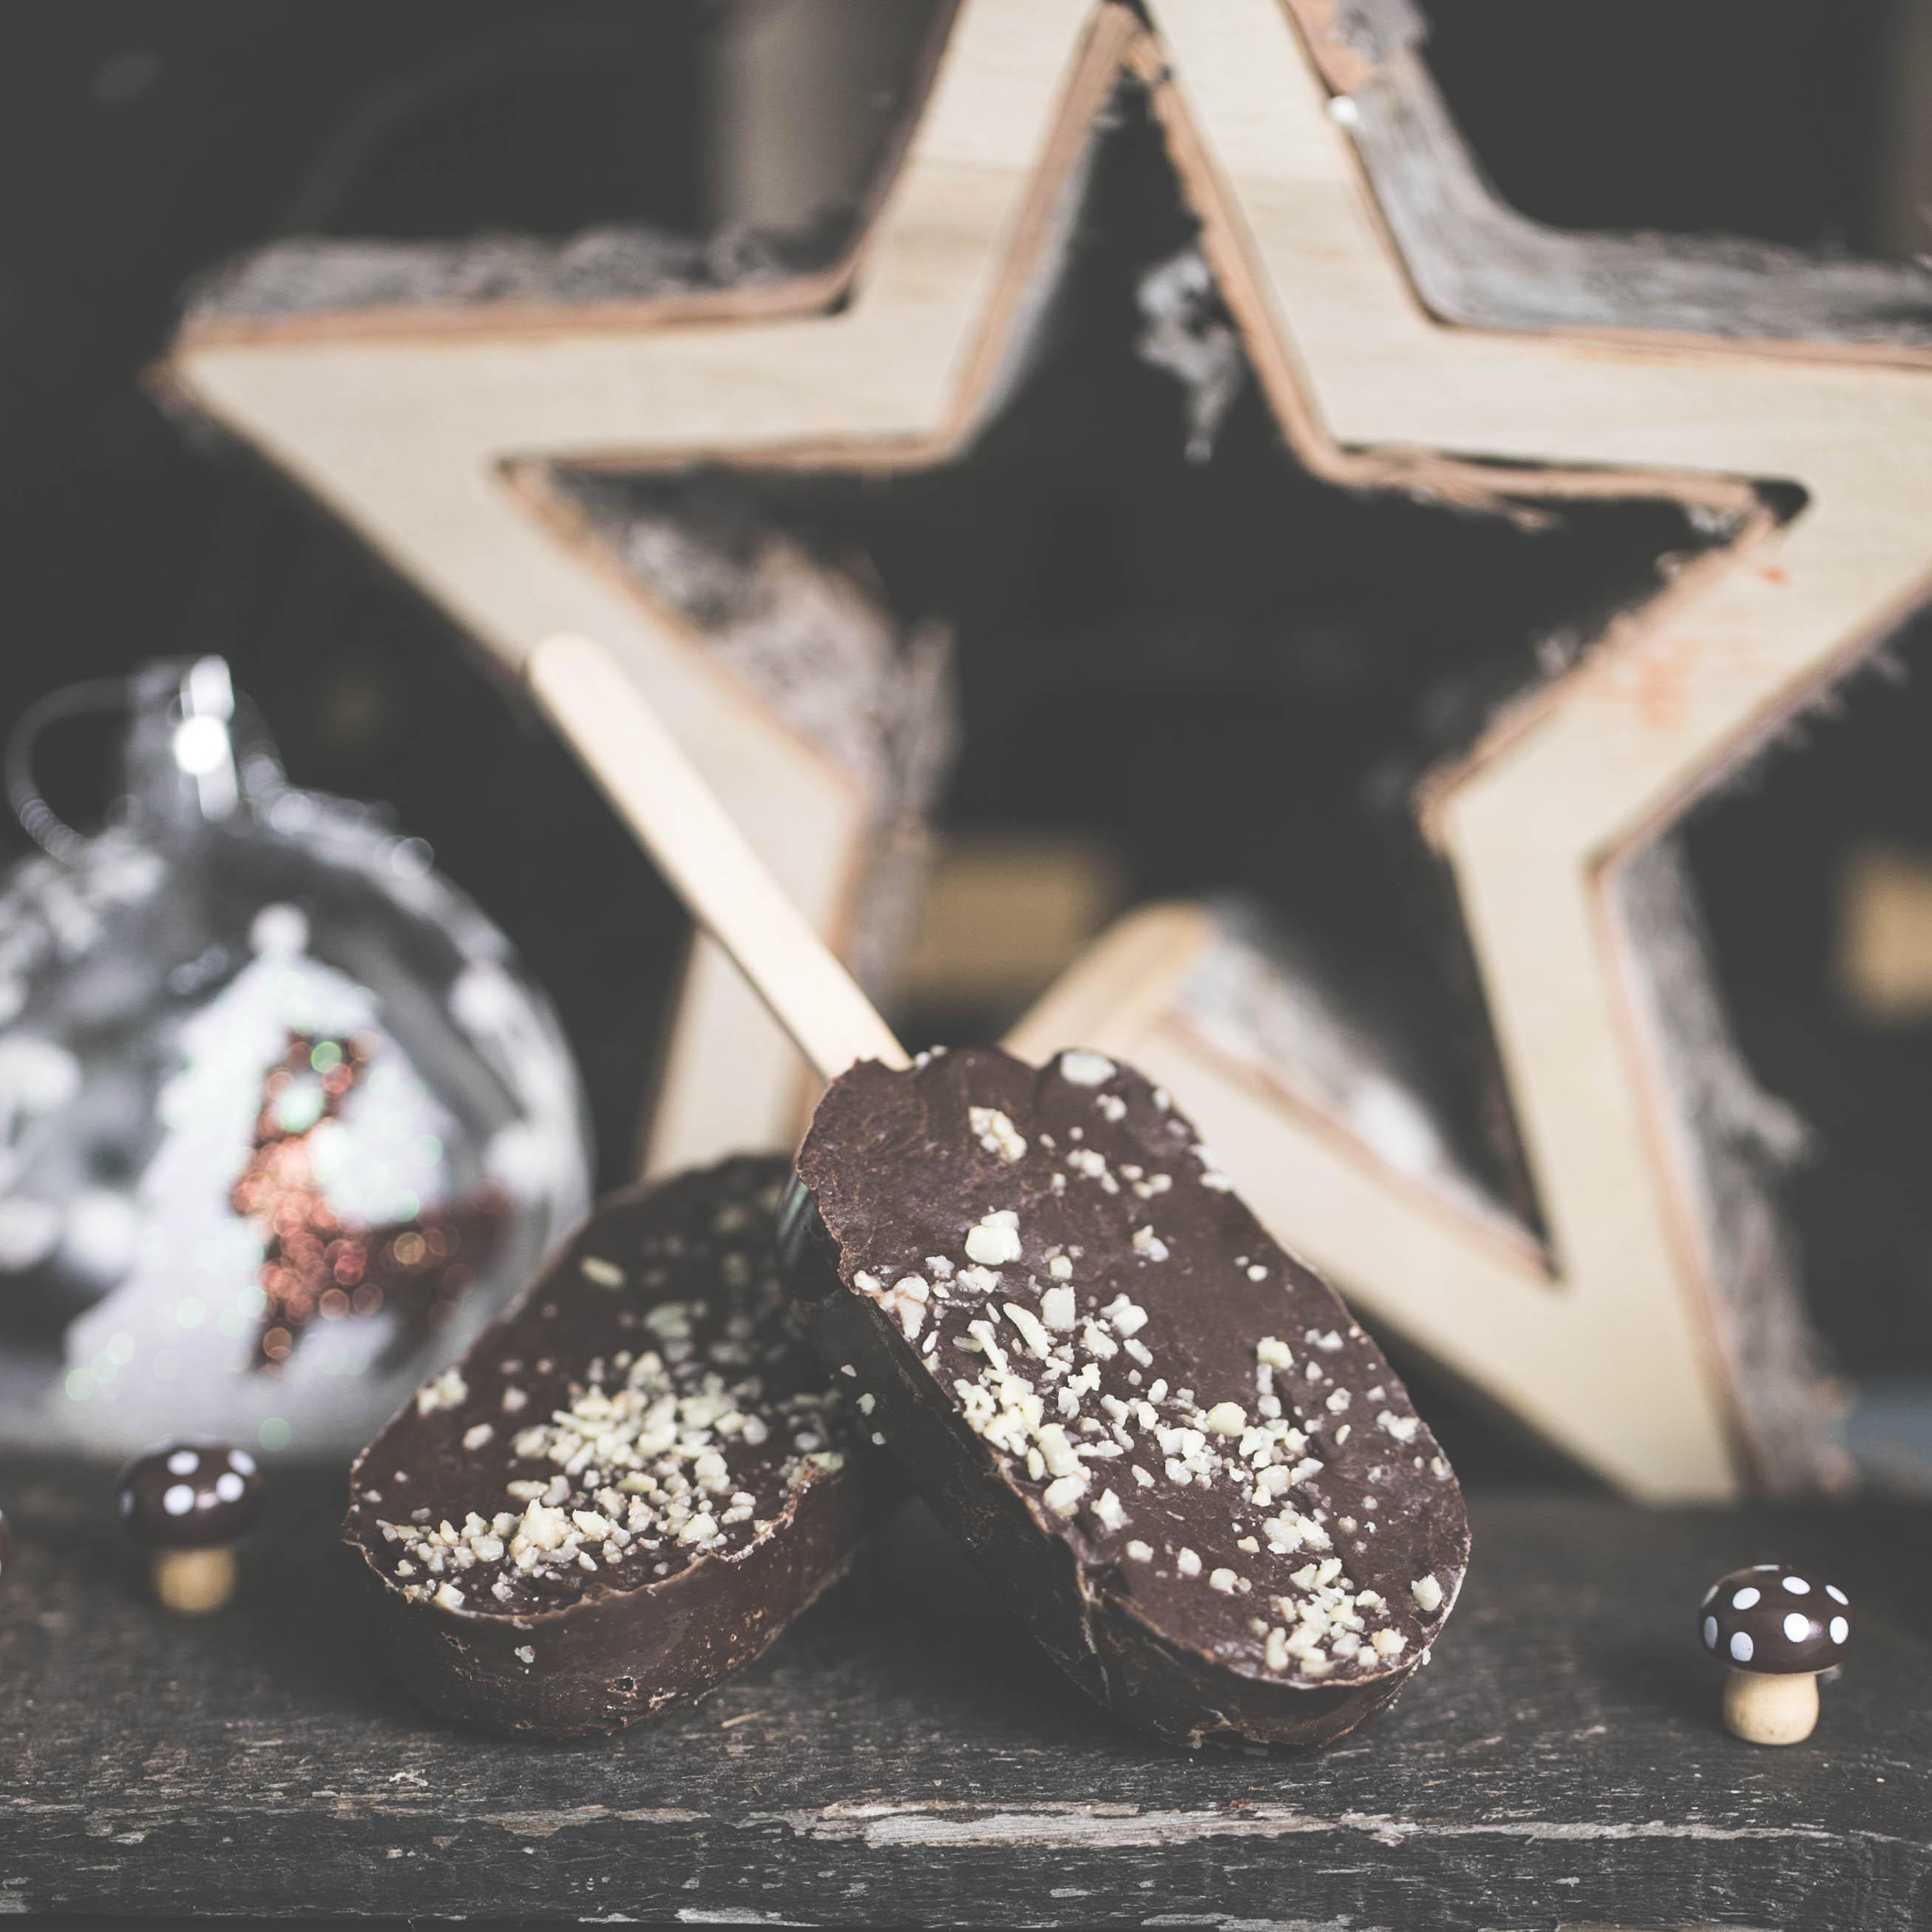 Trinkschokolade oder Falsches Eis am Stiel